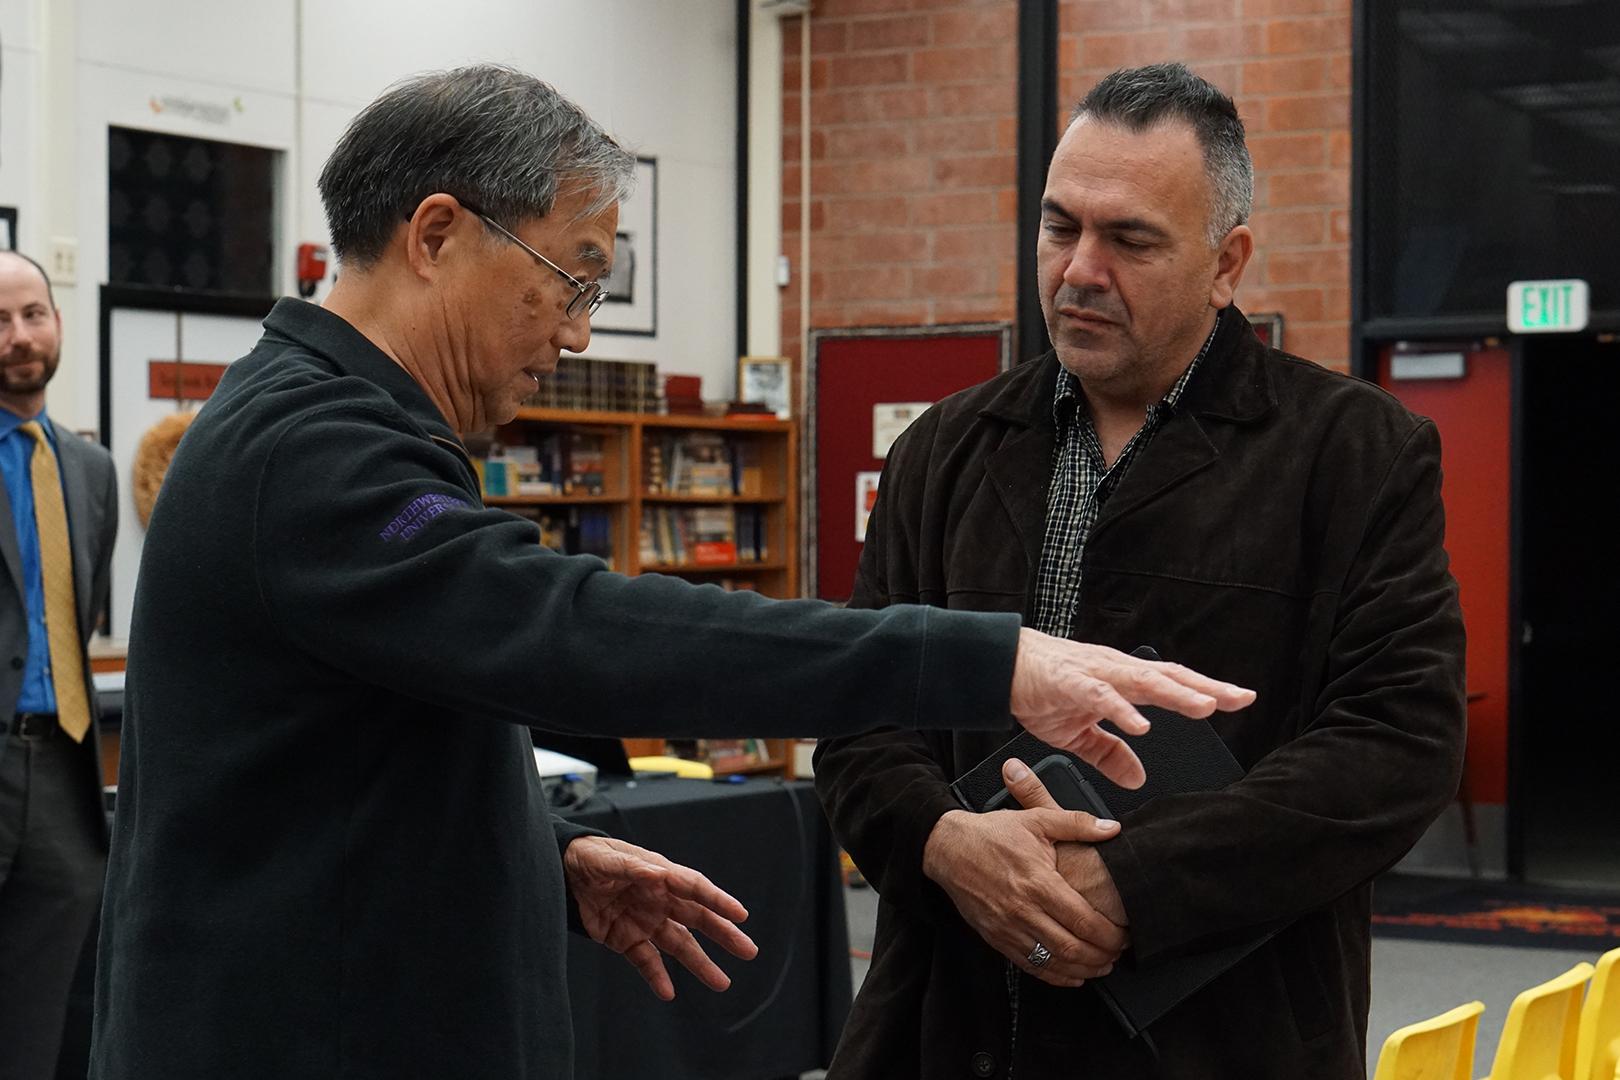 Chang and De La Torre